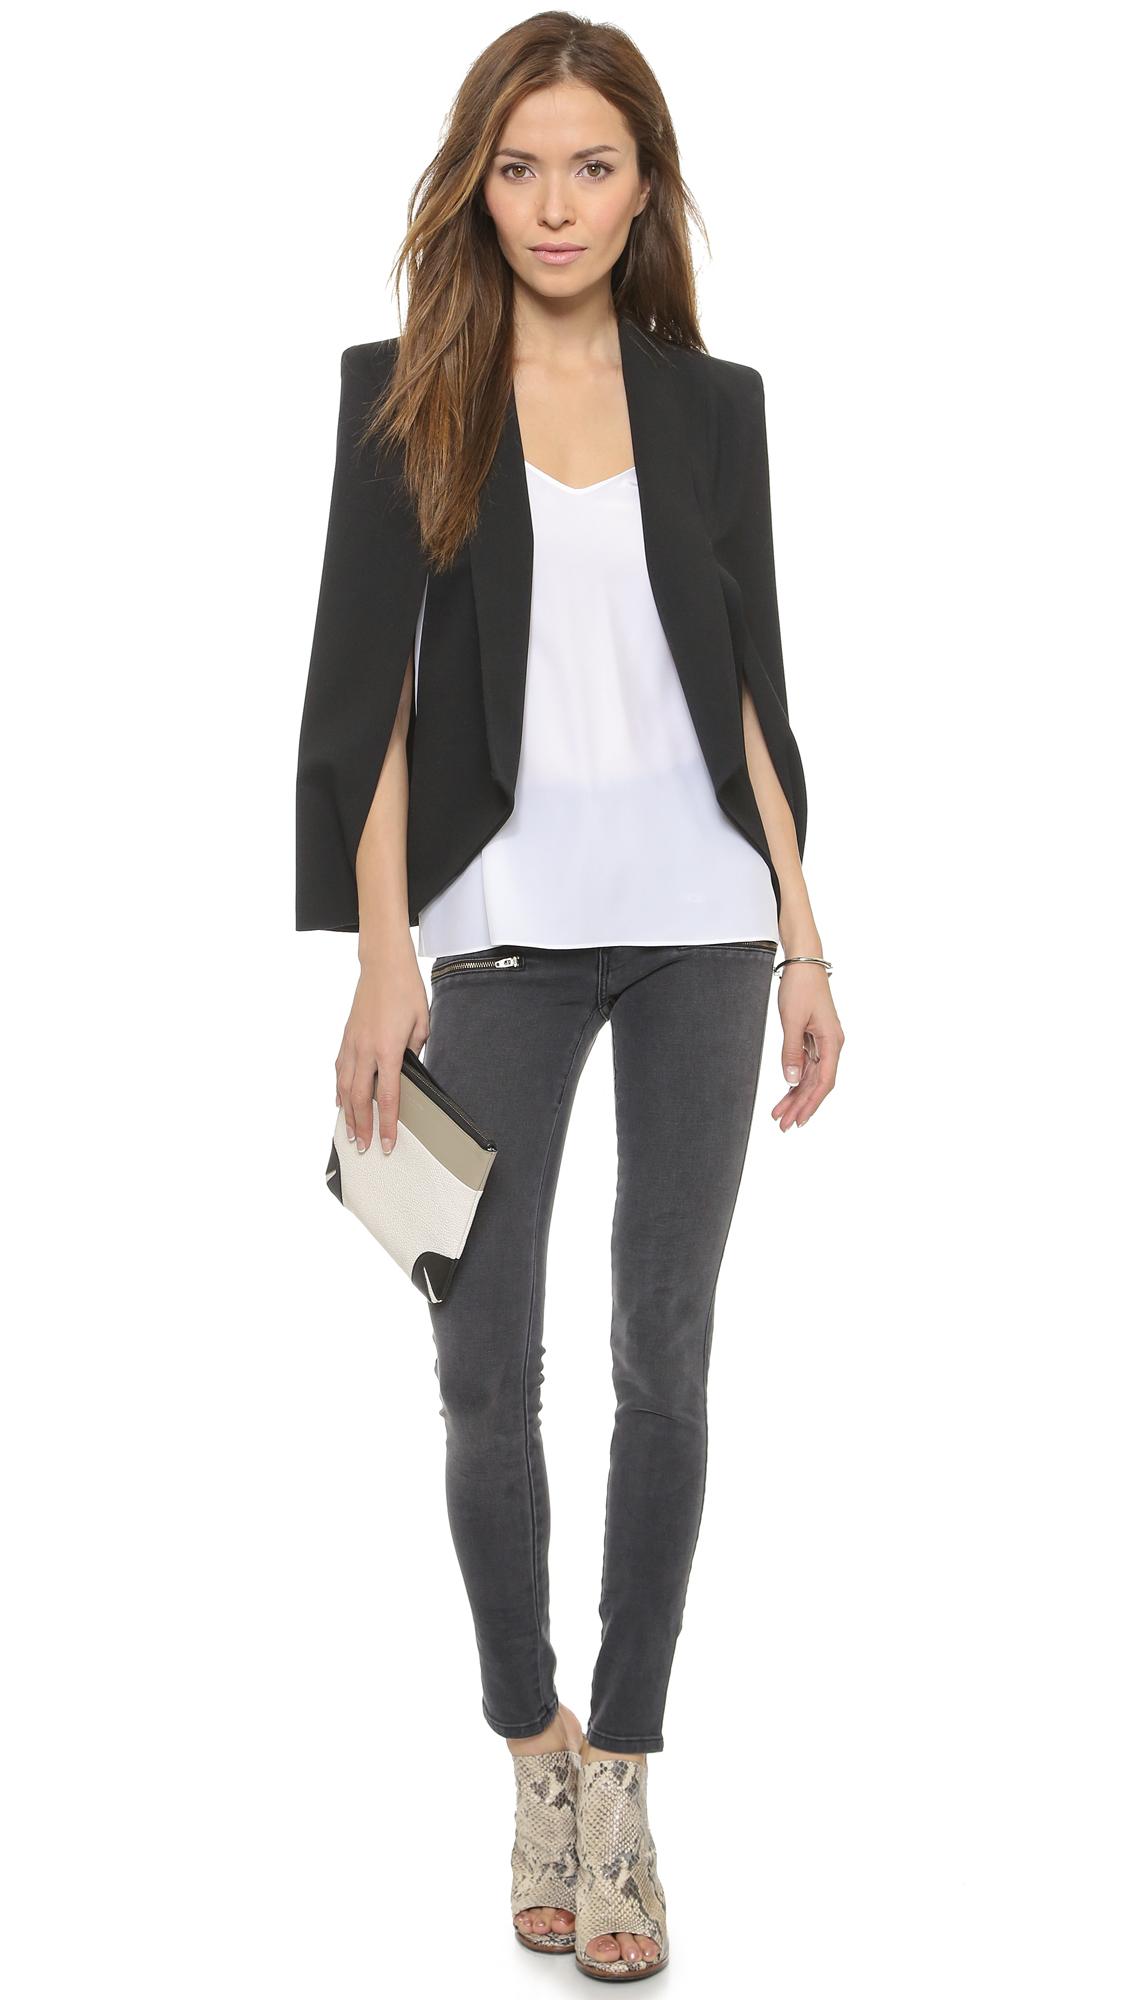 James jeans Blazer Cape in Black | Lyst